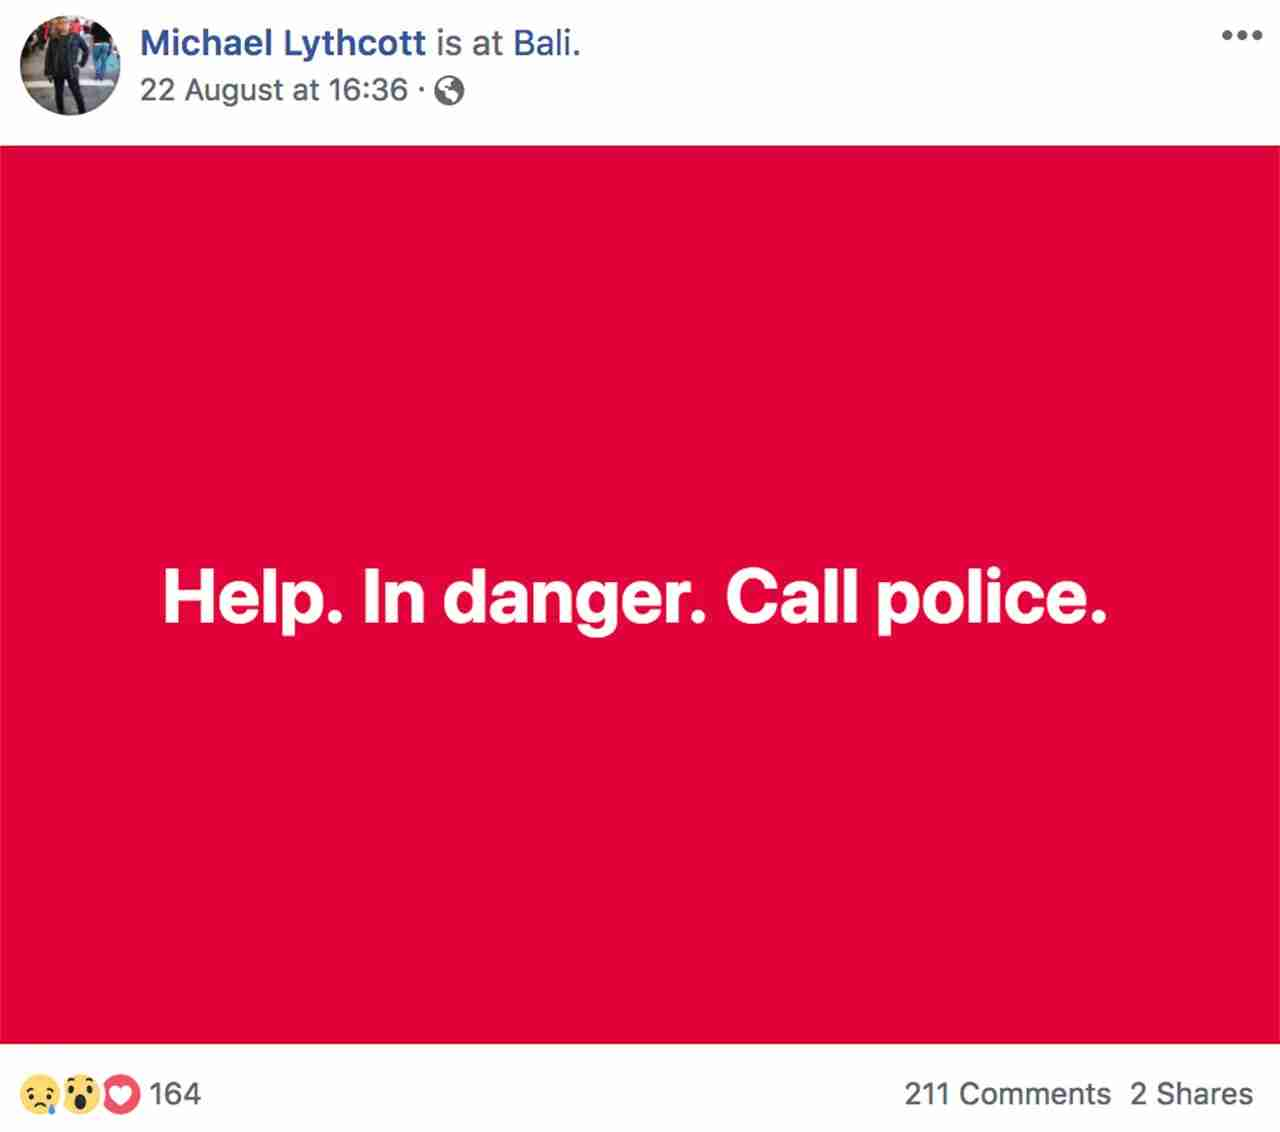 Screenshot courtesy Michael Lythcott